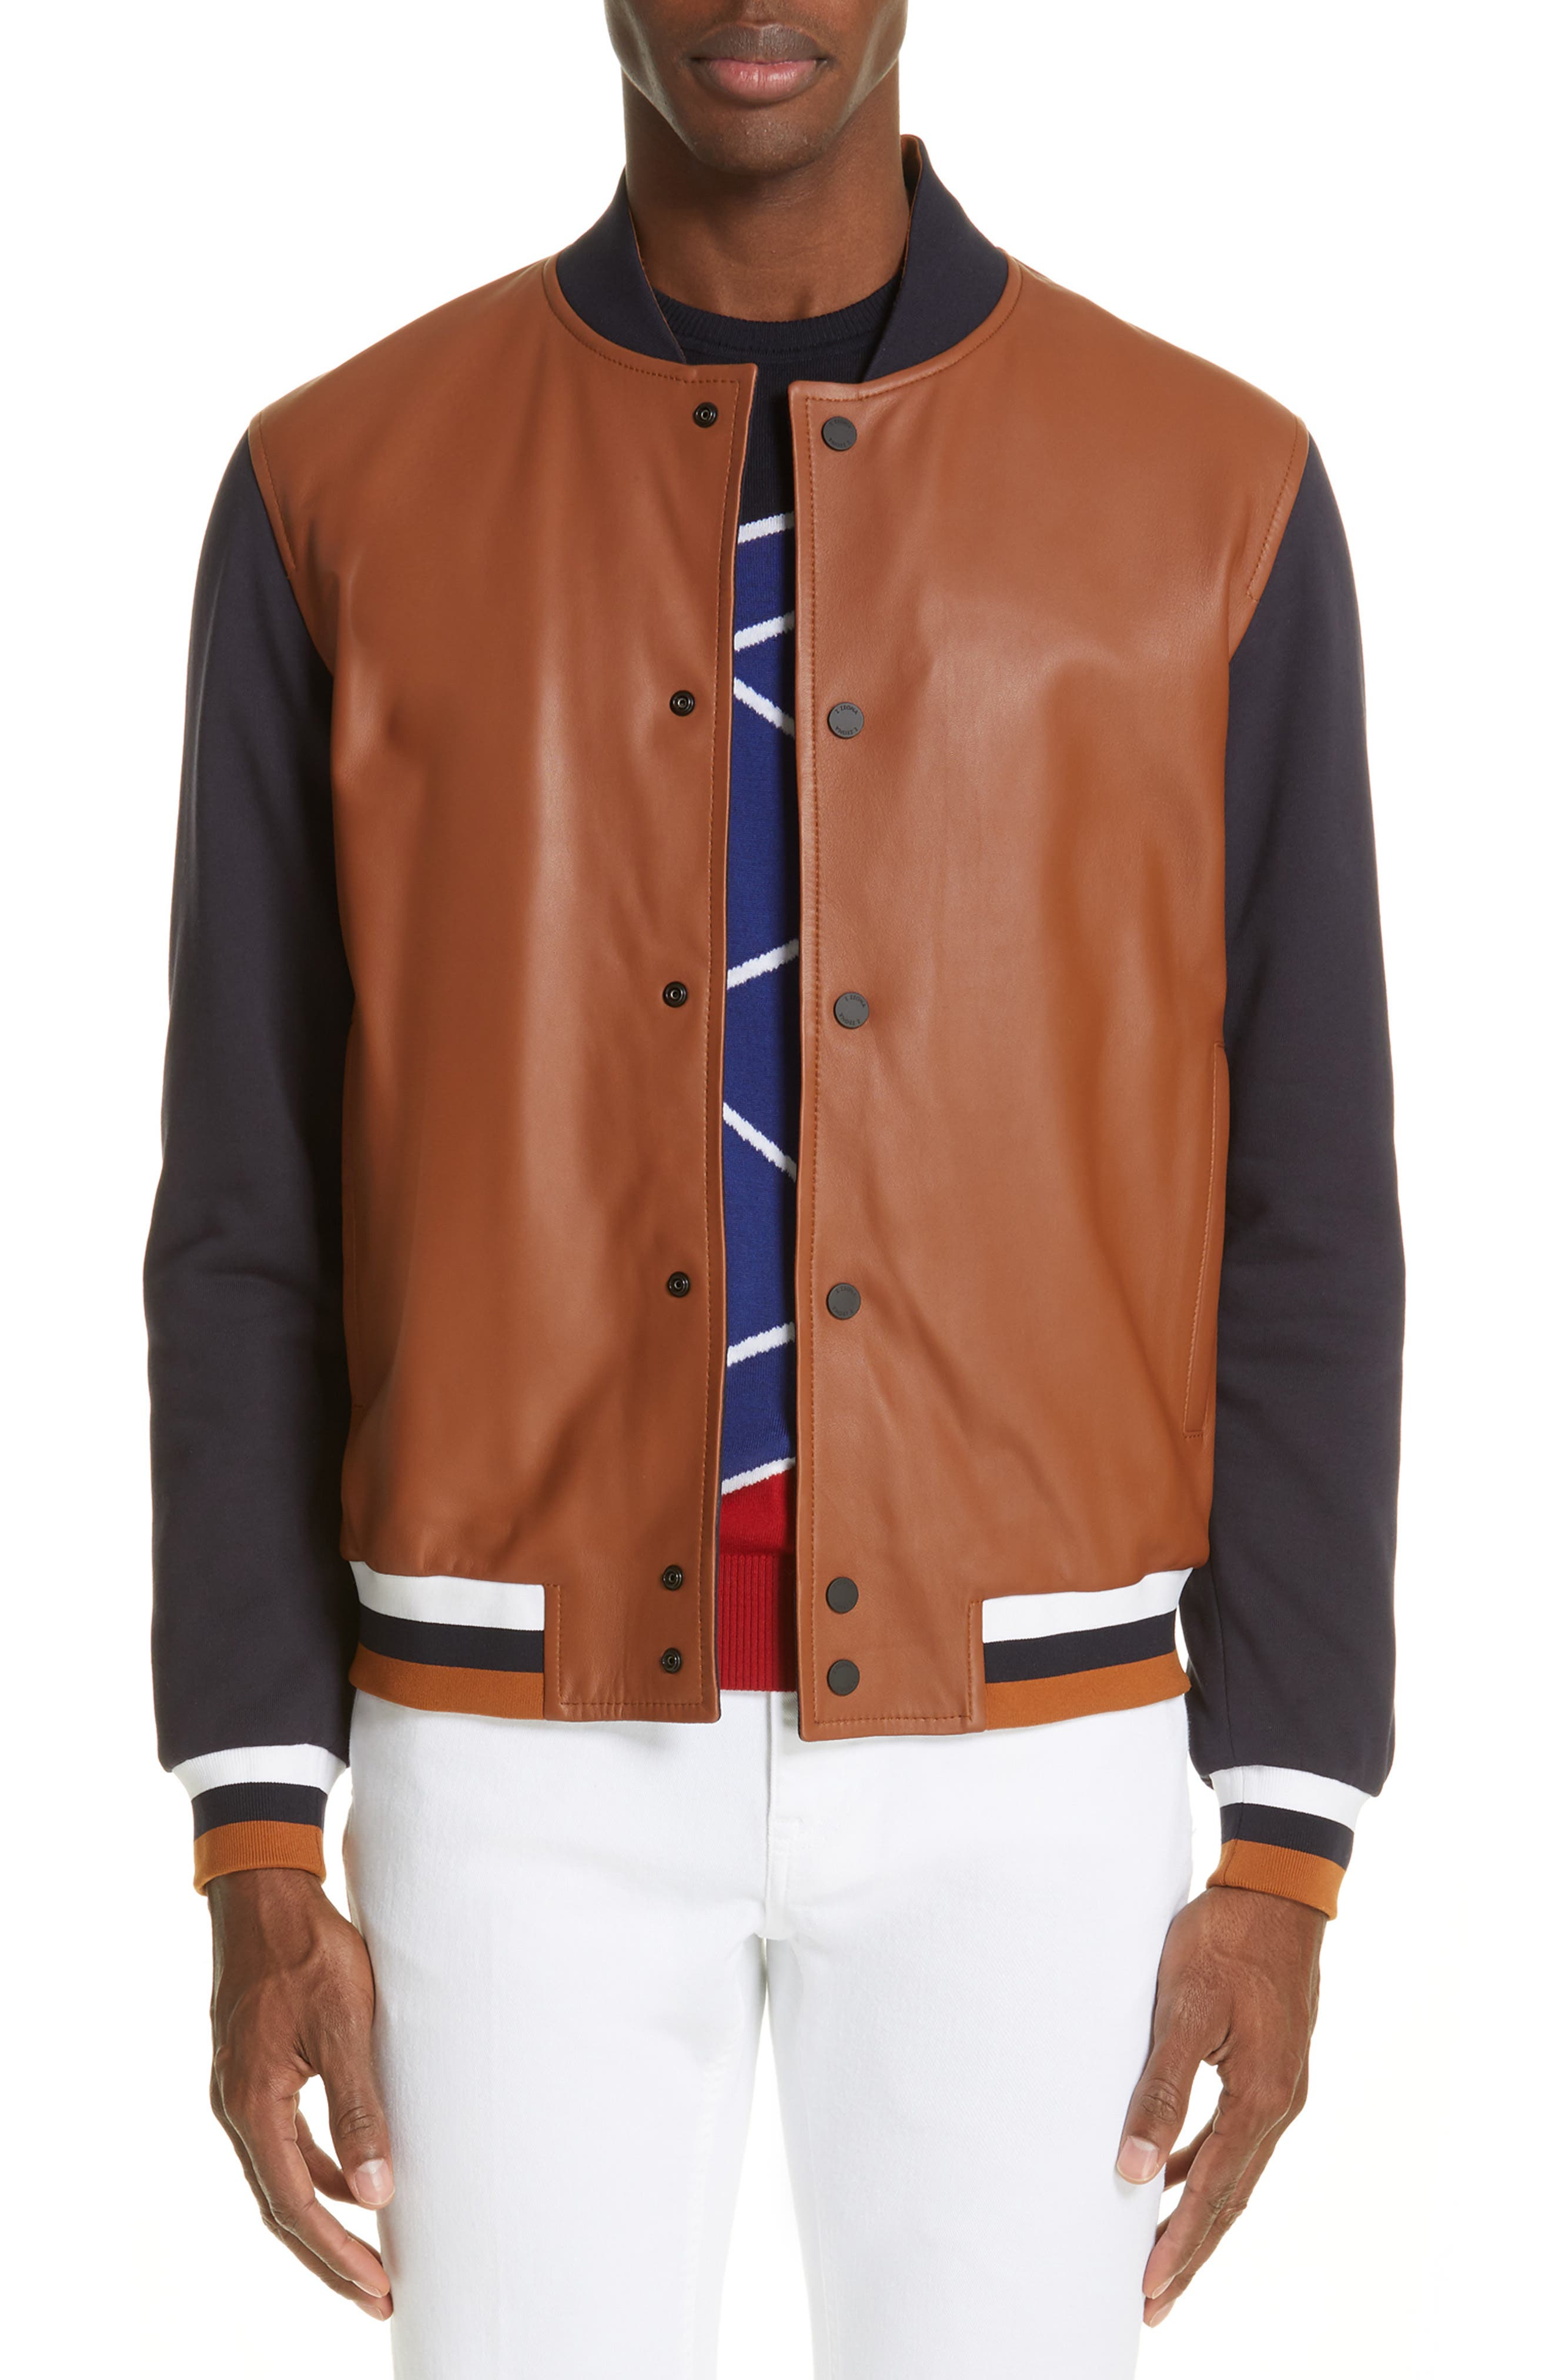 Z ZEGNA Contrast Leather Bomber Jacket, Main, color, NAVY/ BROWN